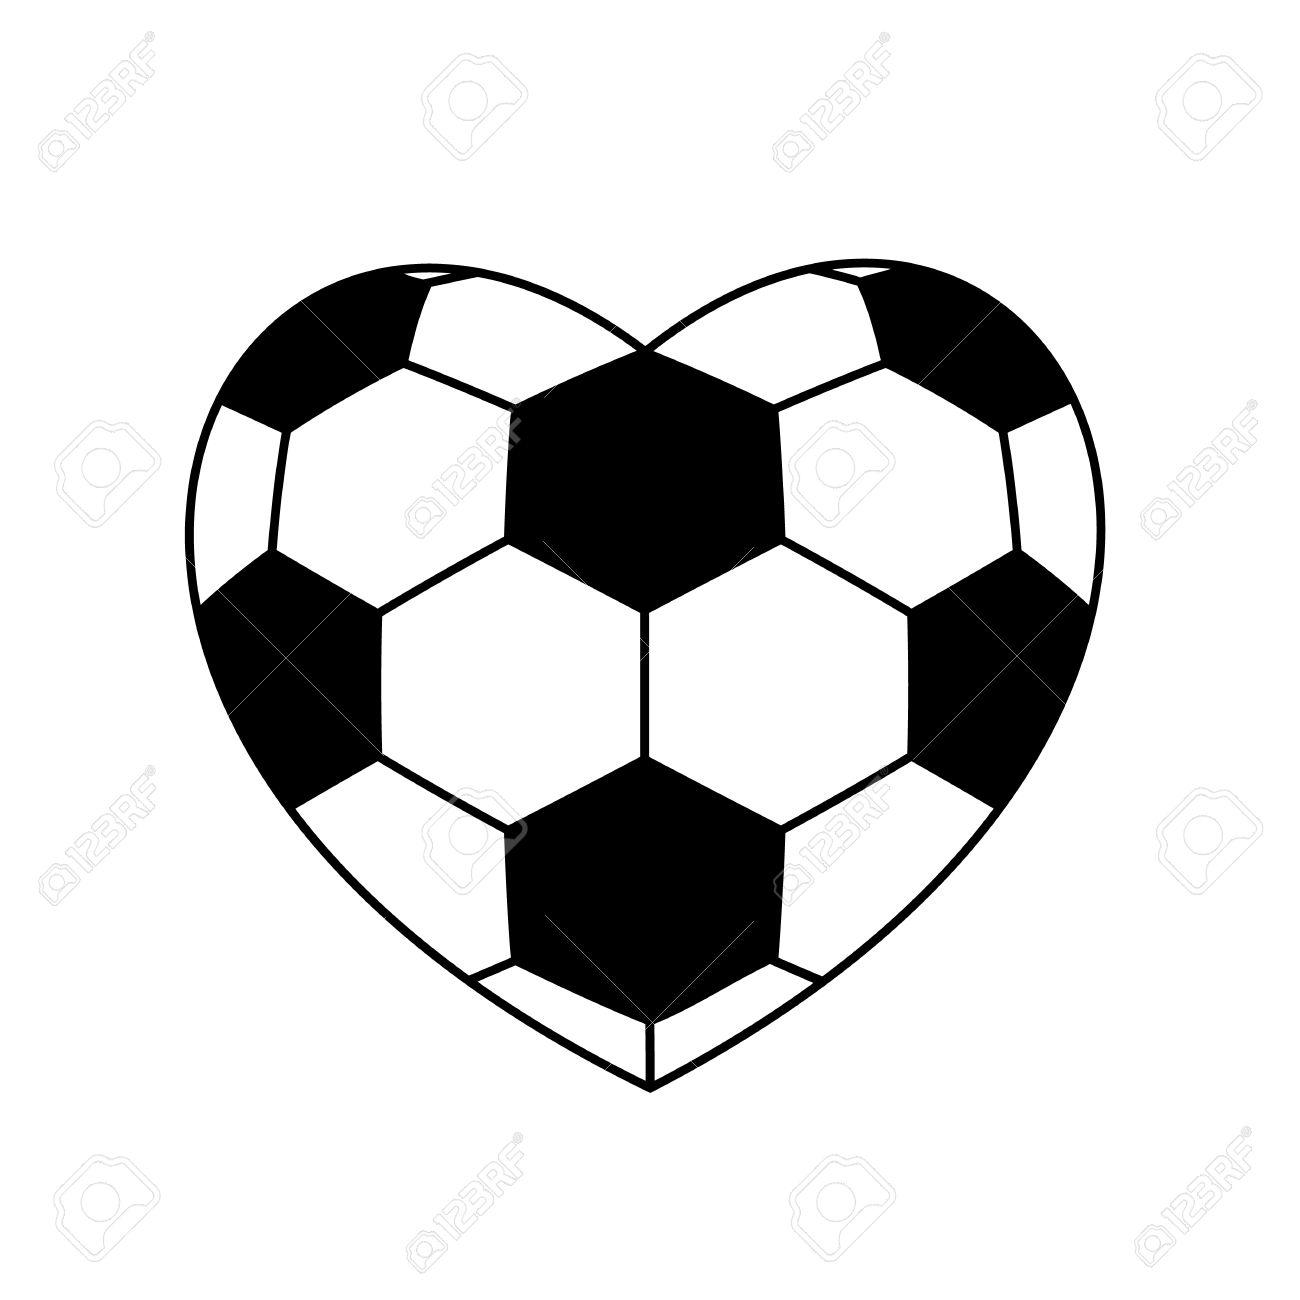 Soccer ball heart clipart svg free Soccer ball heart clipart - ClipartFest svg free